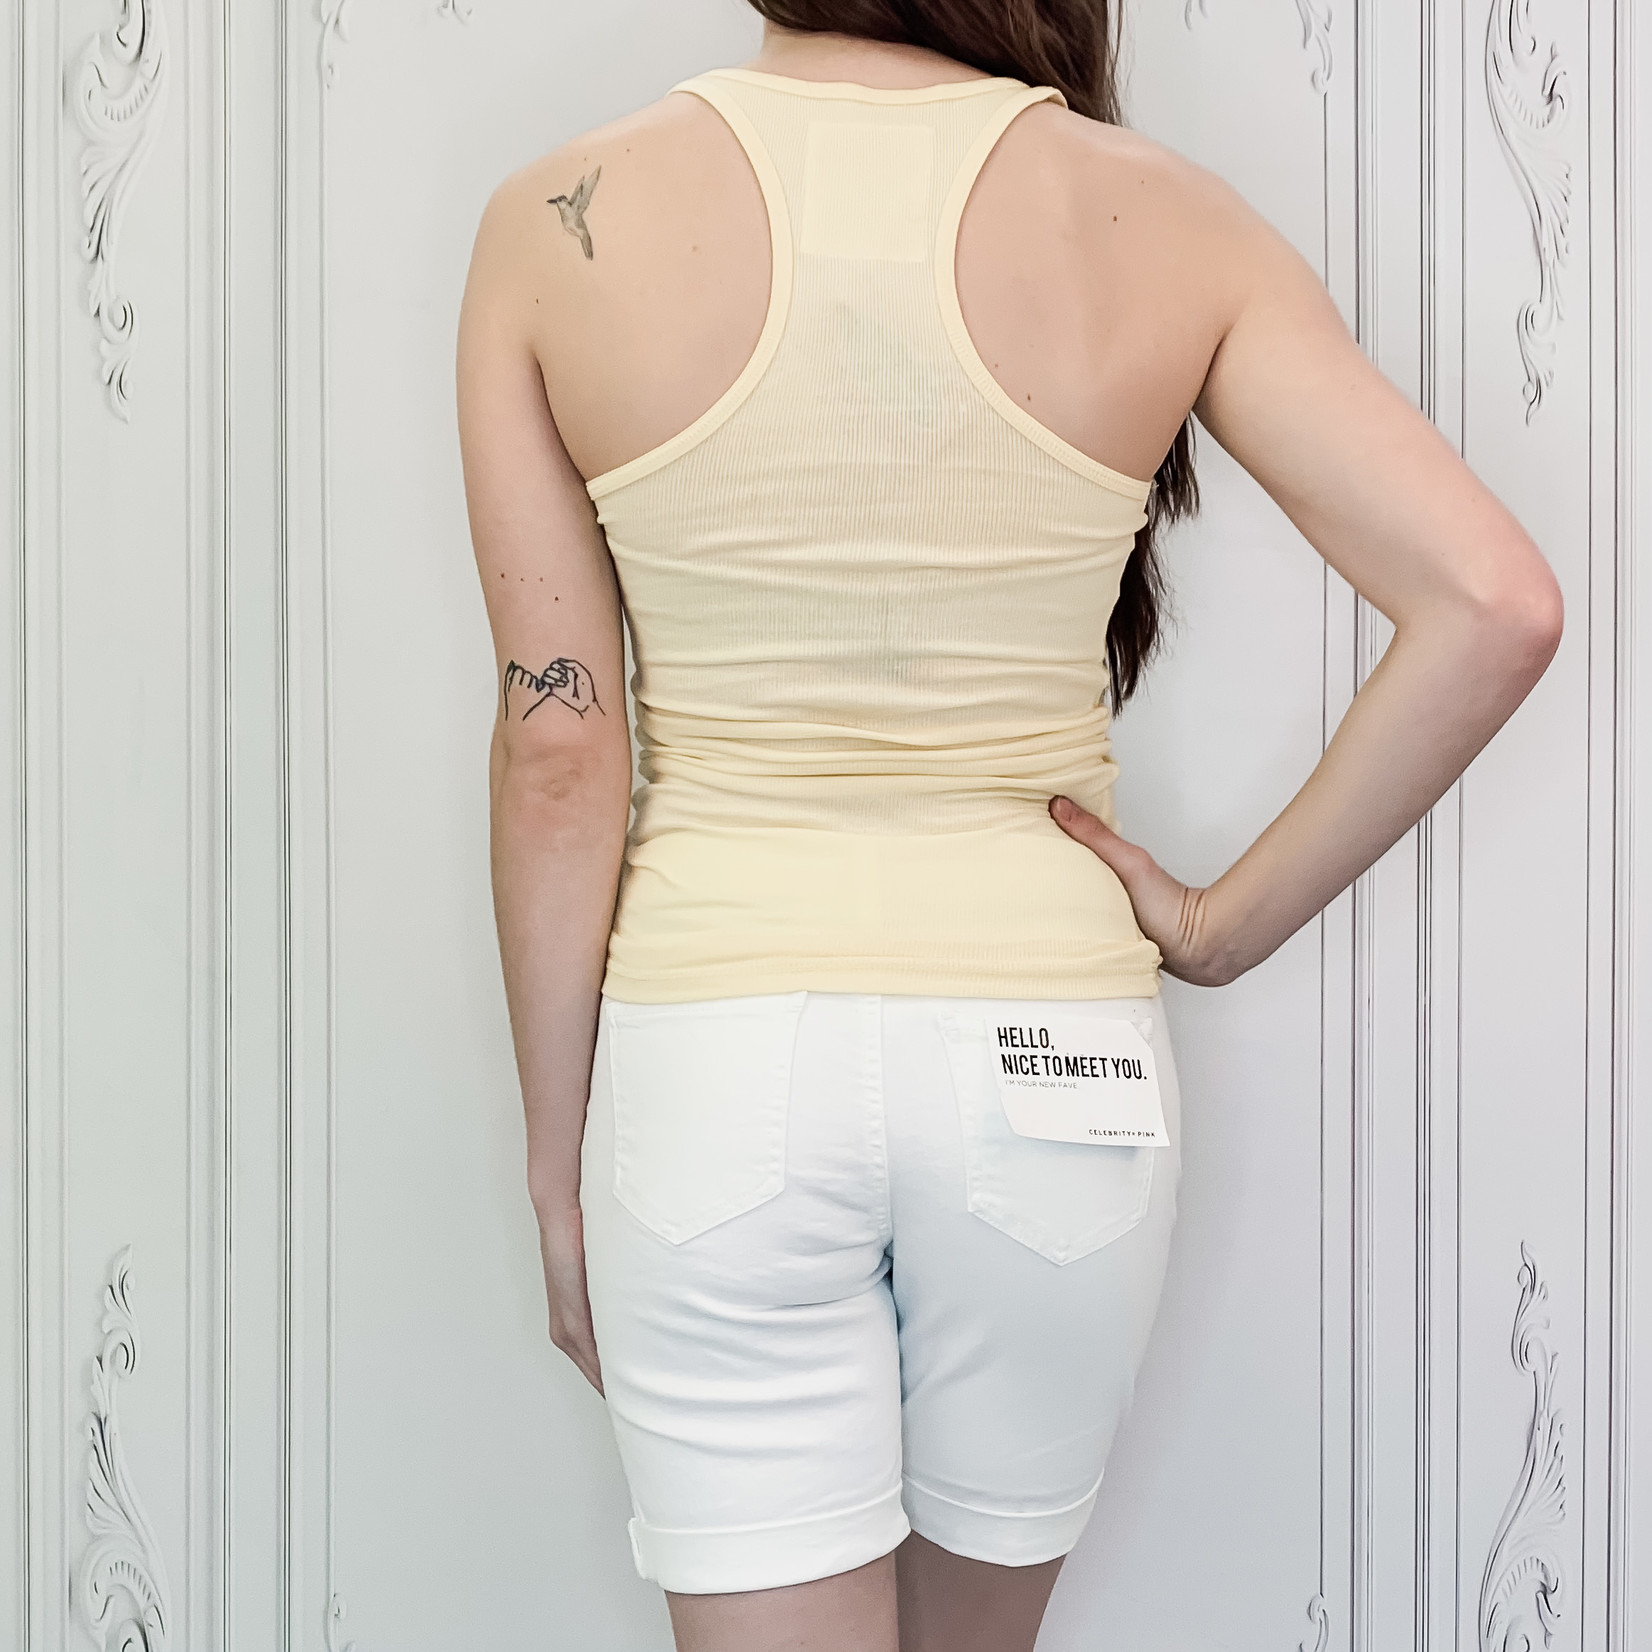 Cara bermuda shorts